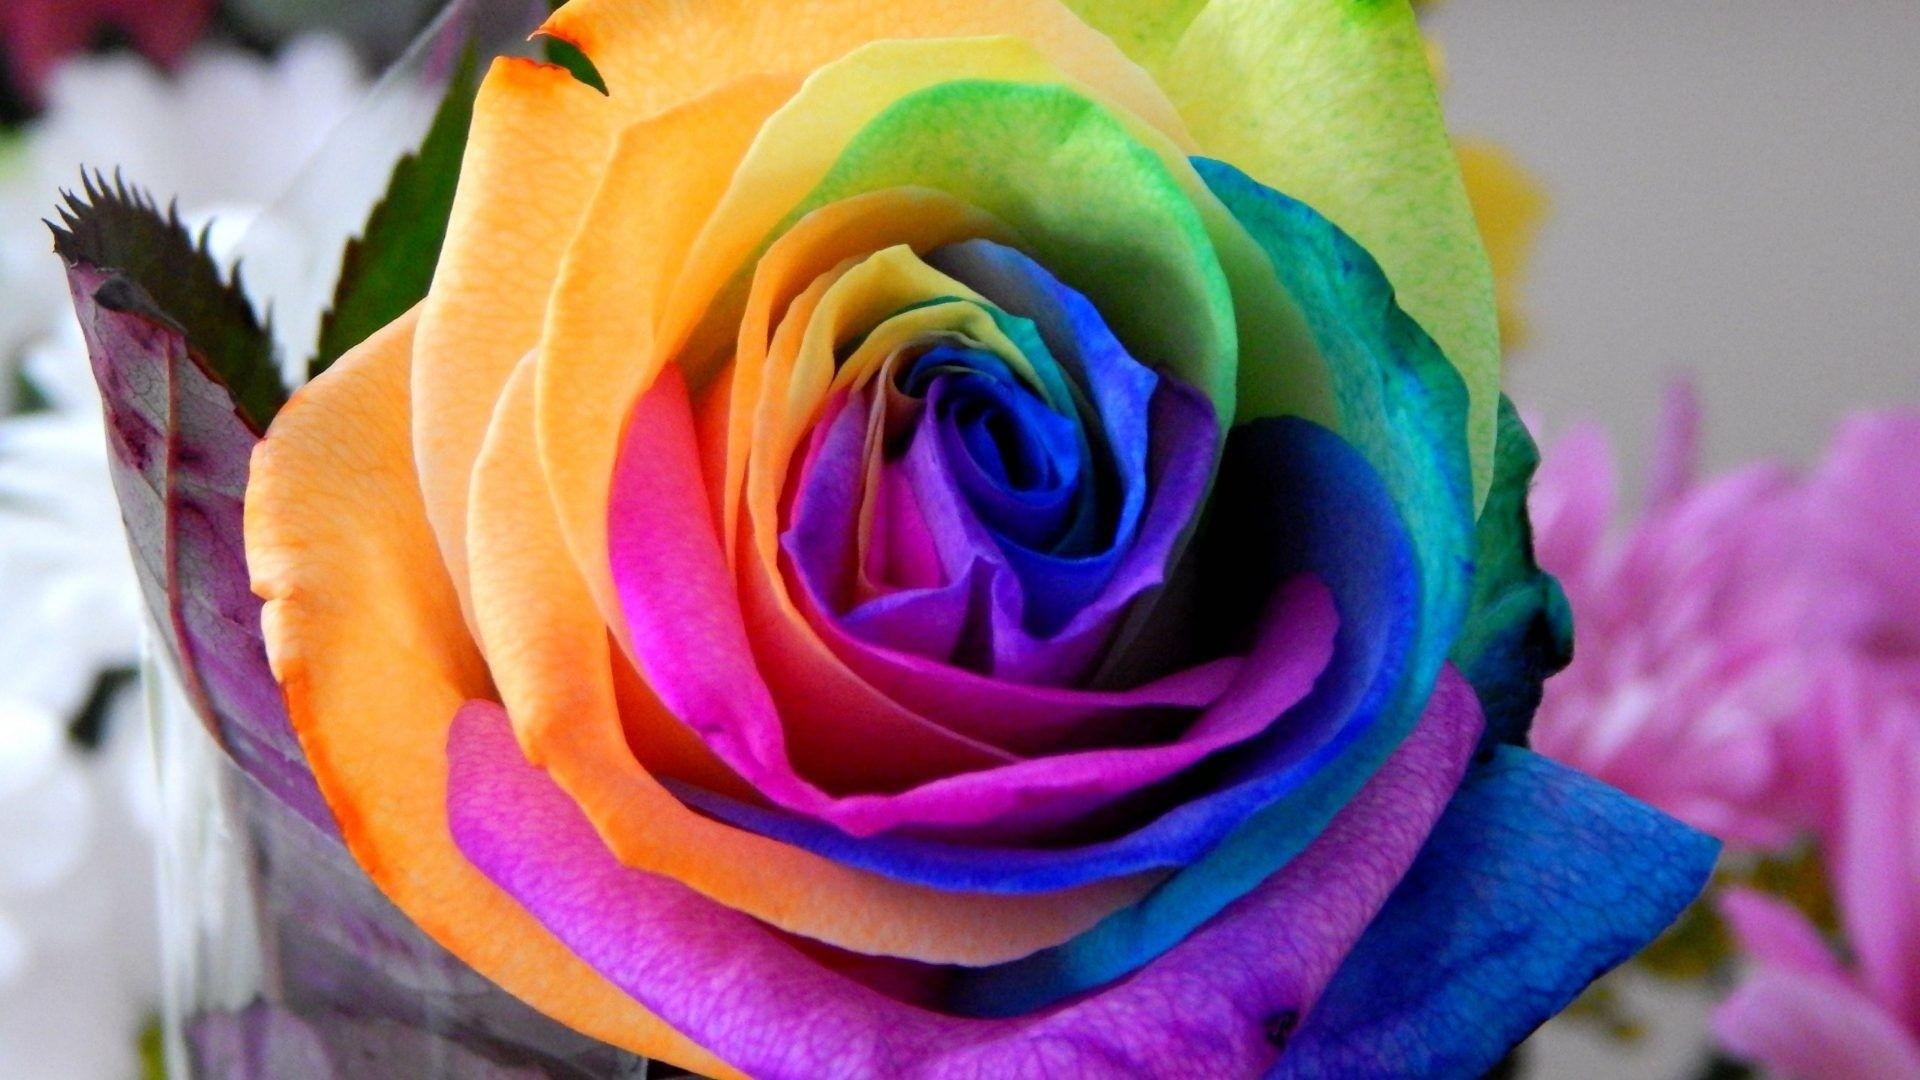 Rainbow Rose Download Wallpaper